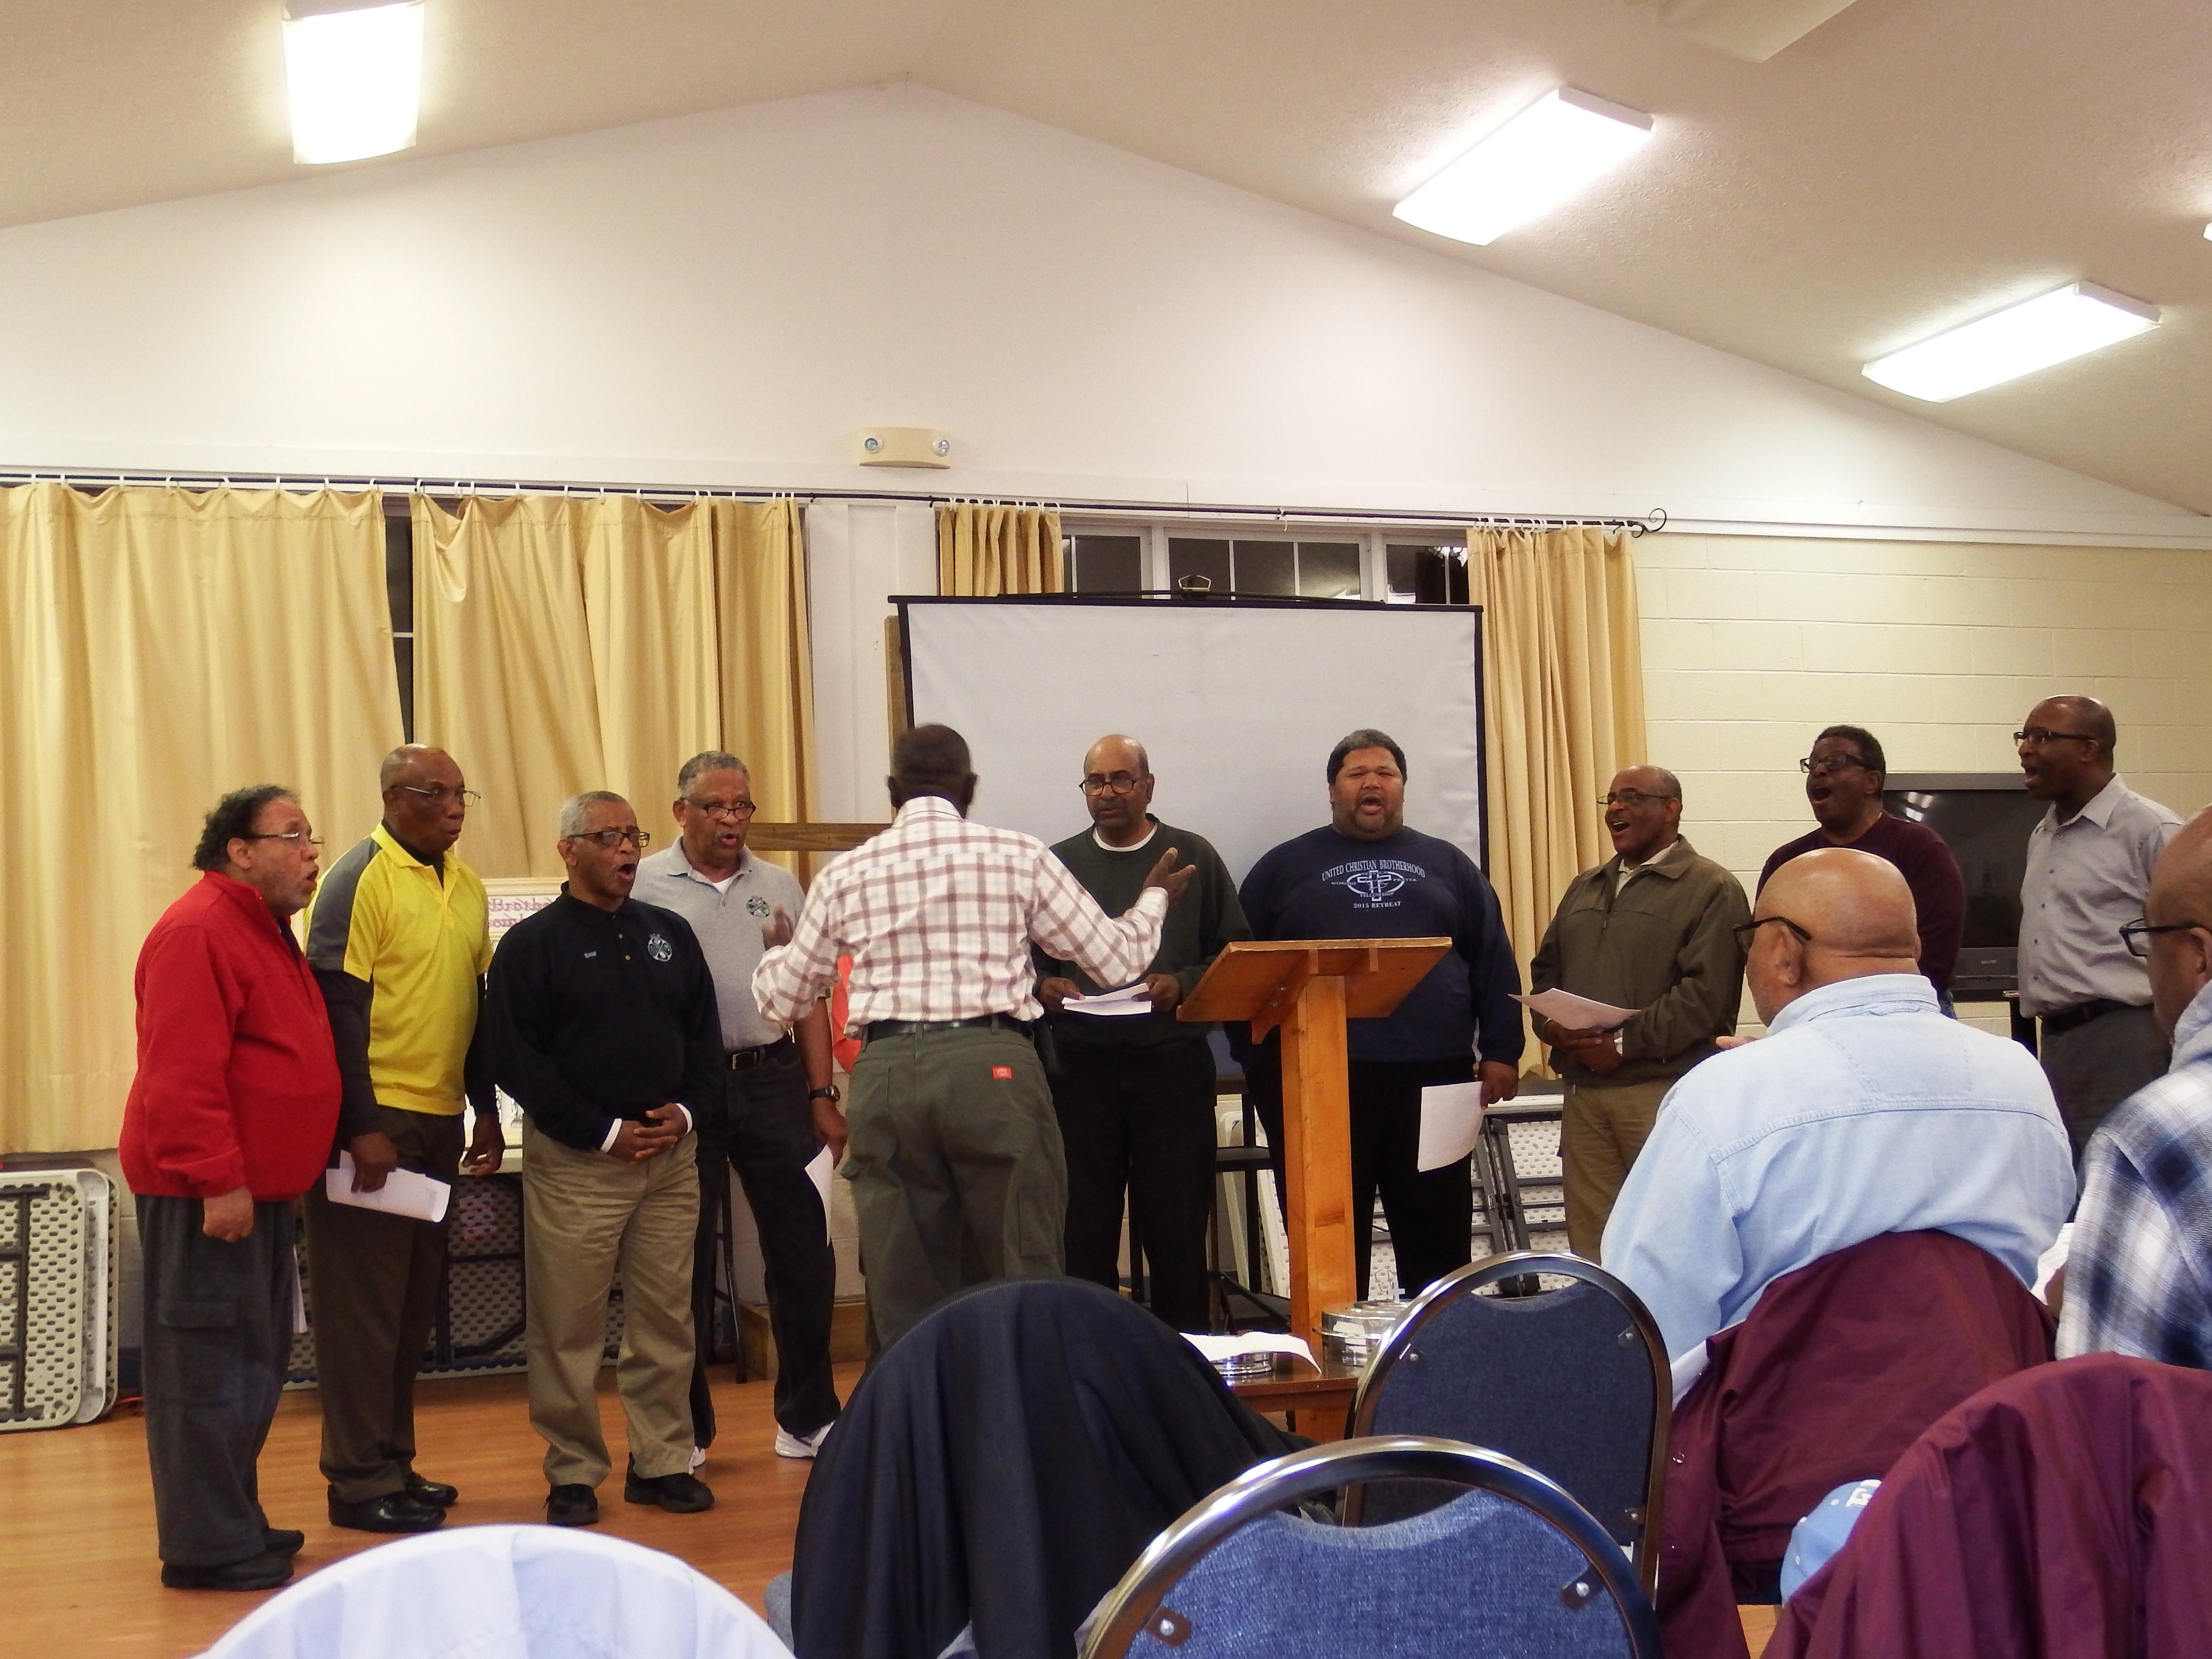 UCB Men's Choir at 2016 Retreat